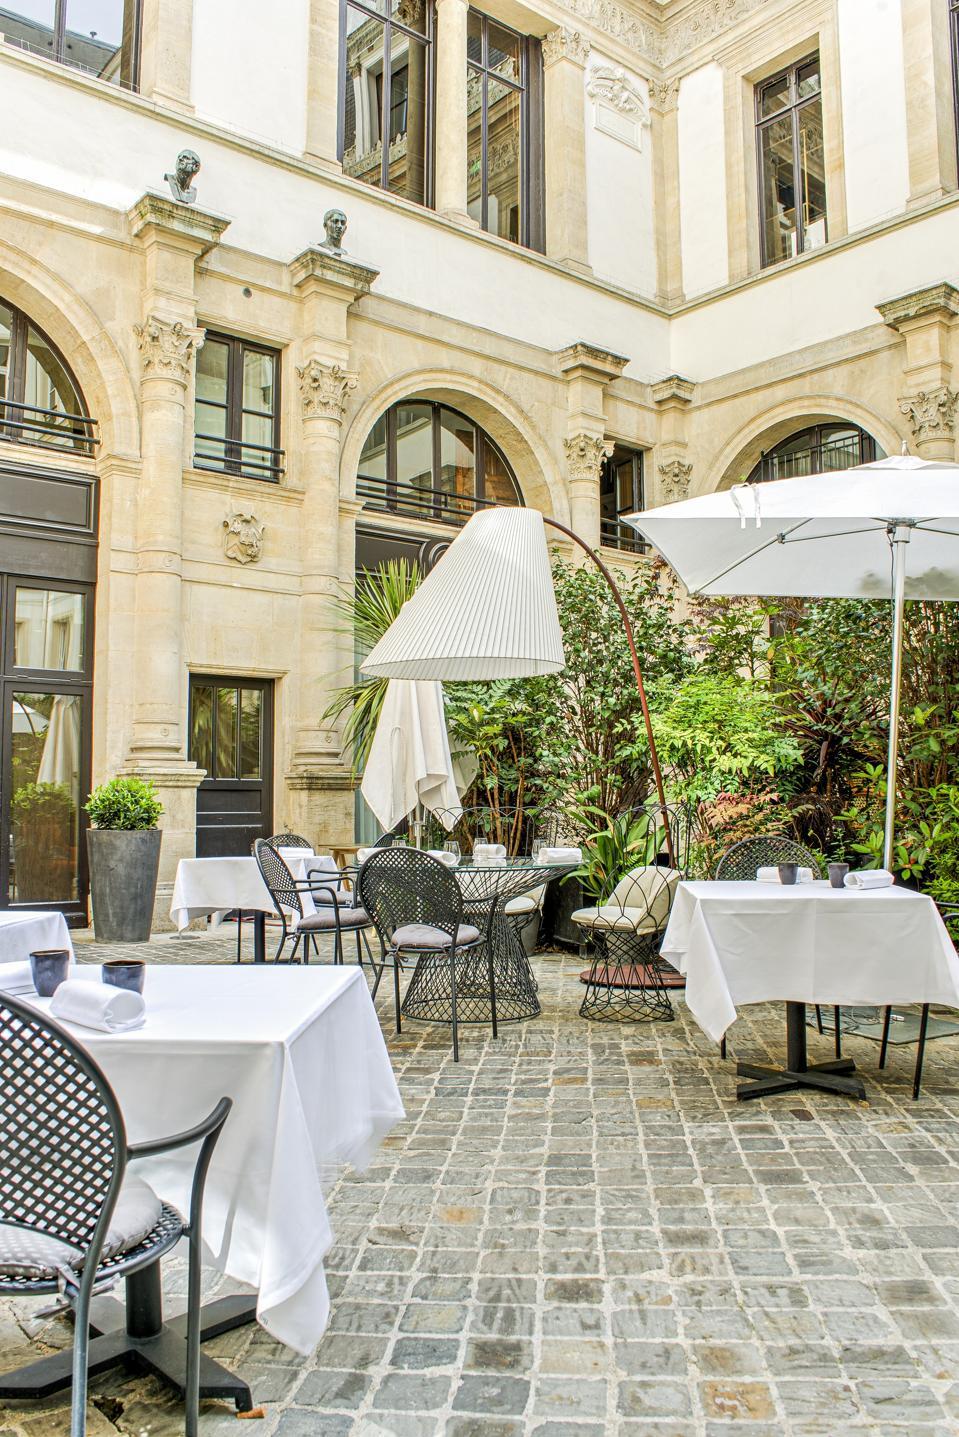 The one Michelin-star restaurant Akrame in Paris